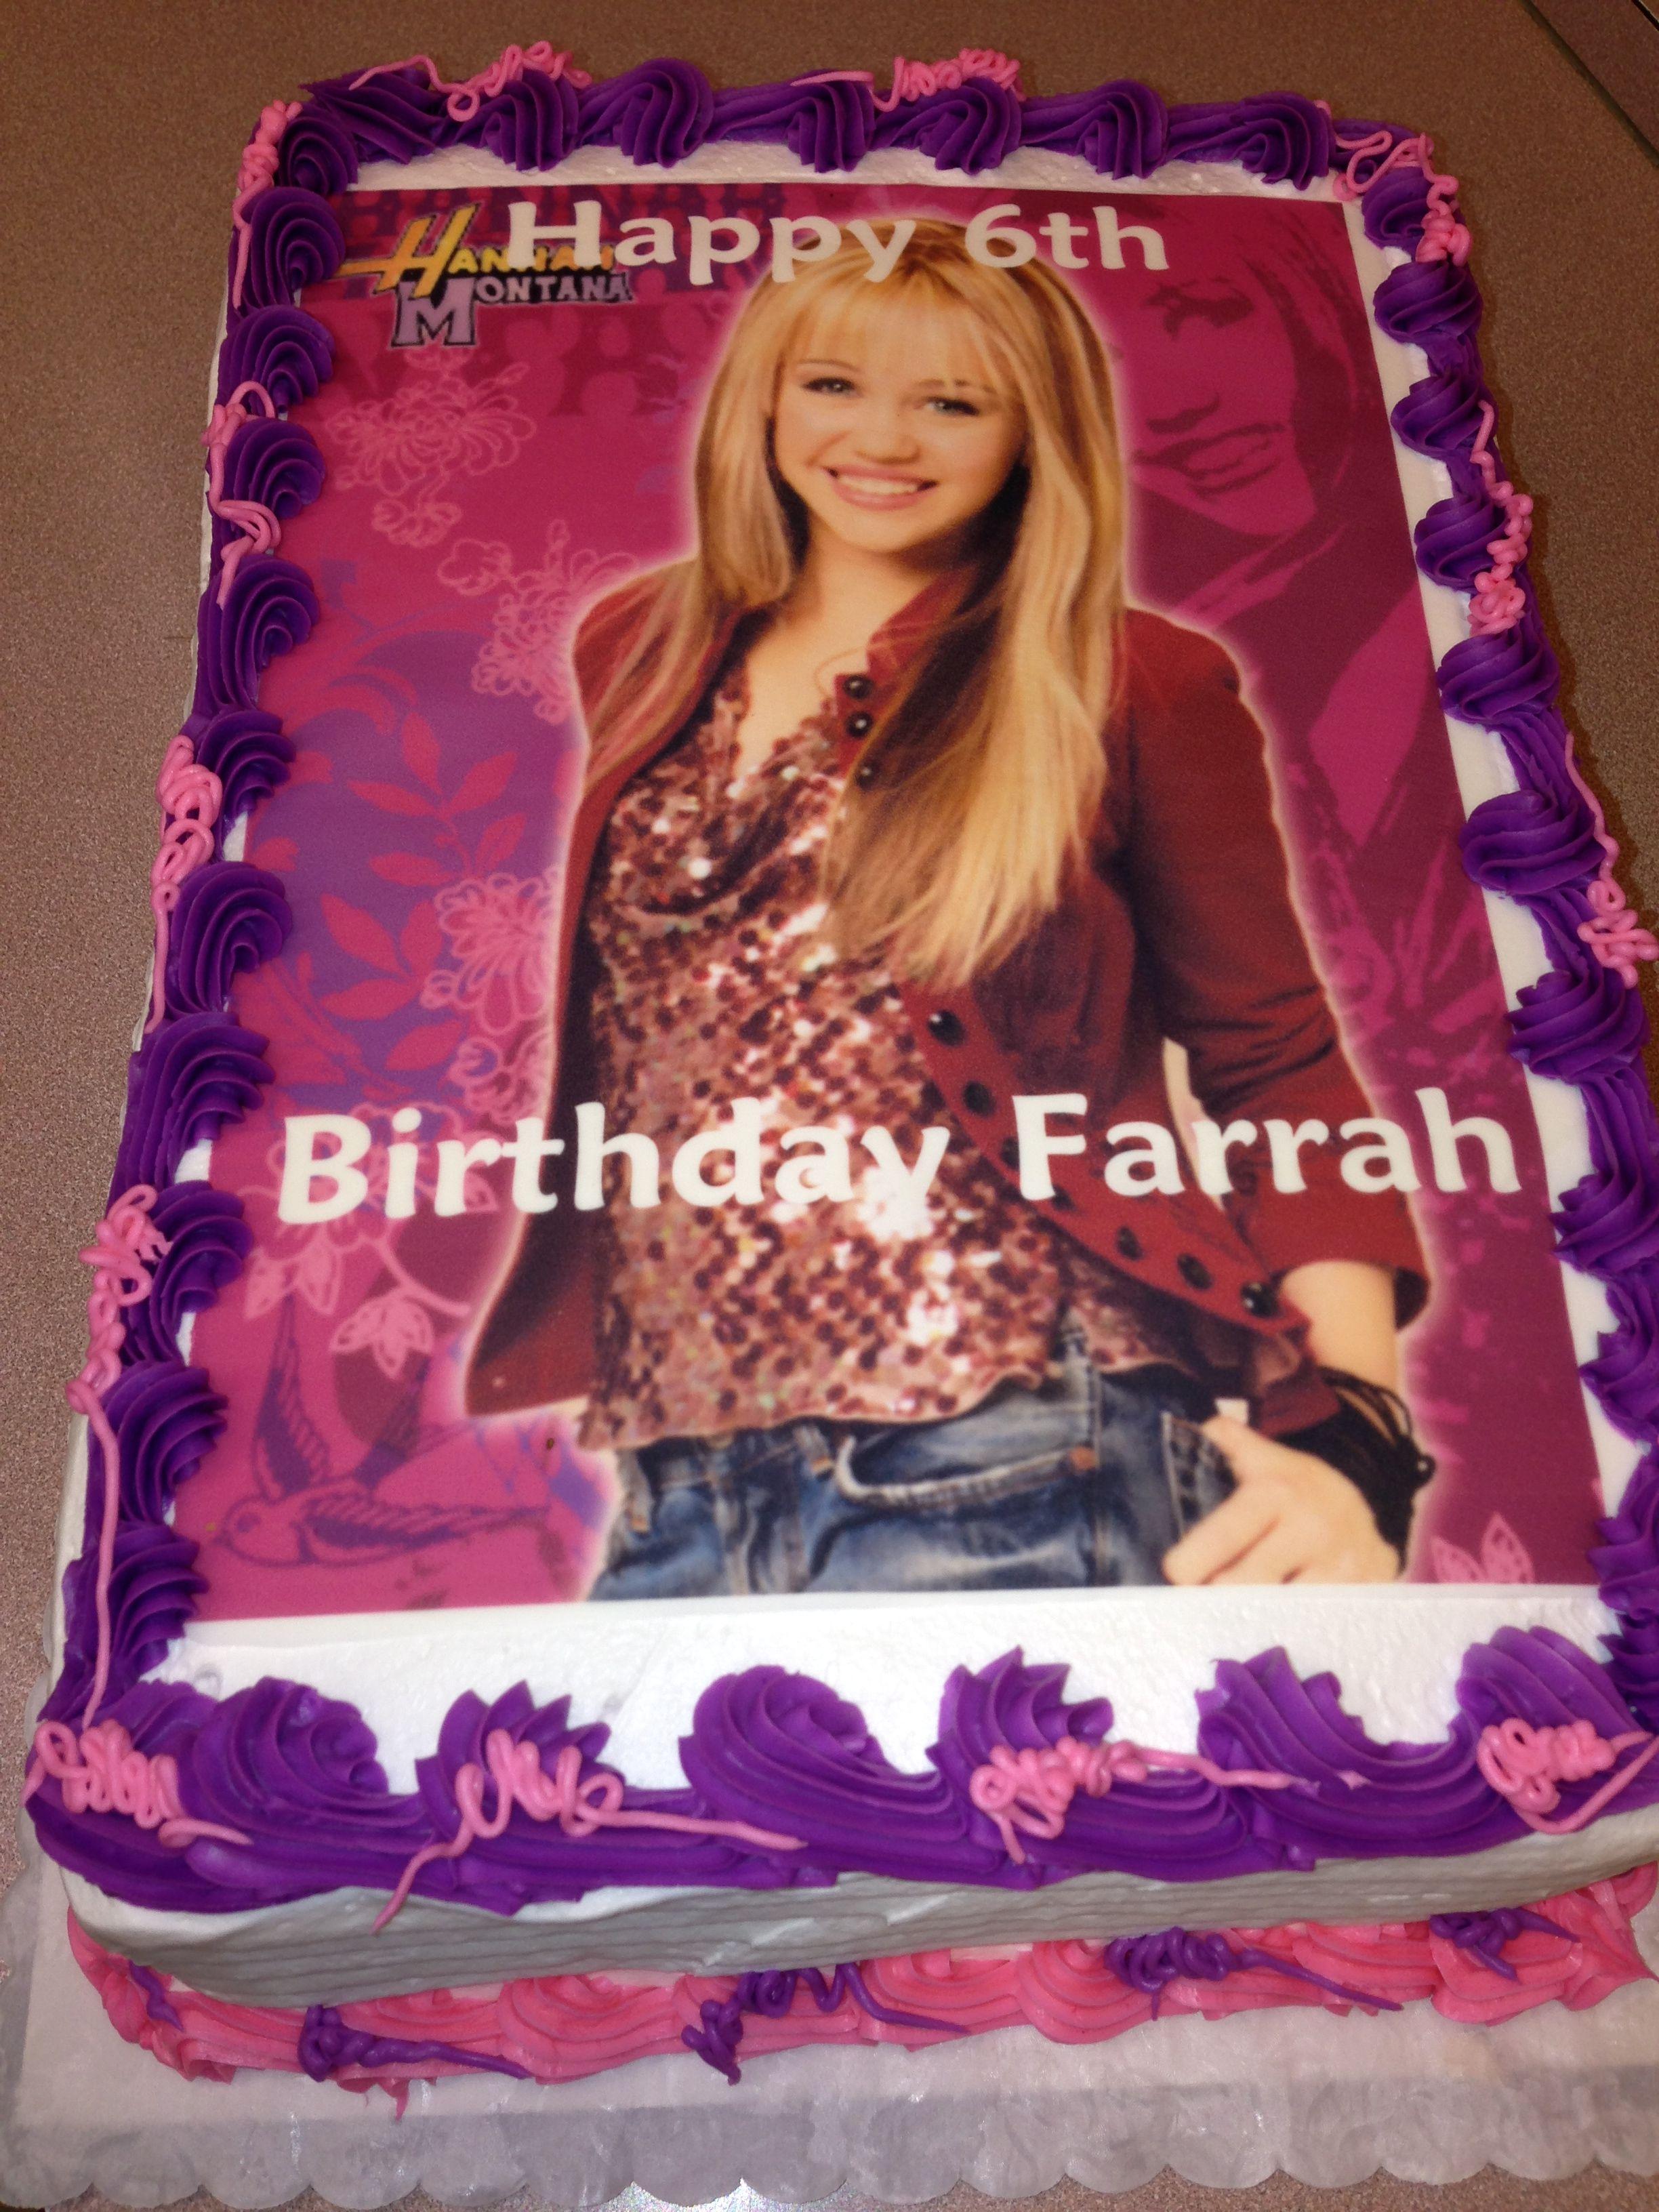 Awe Inspiring 1 4 Sheet Cake With Edible Image Of Hannah Montana Edible Images Birthday Cards Printable Inklcafe Filternl